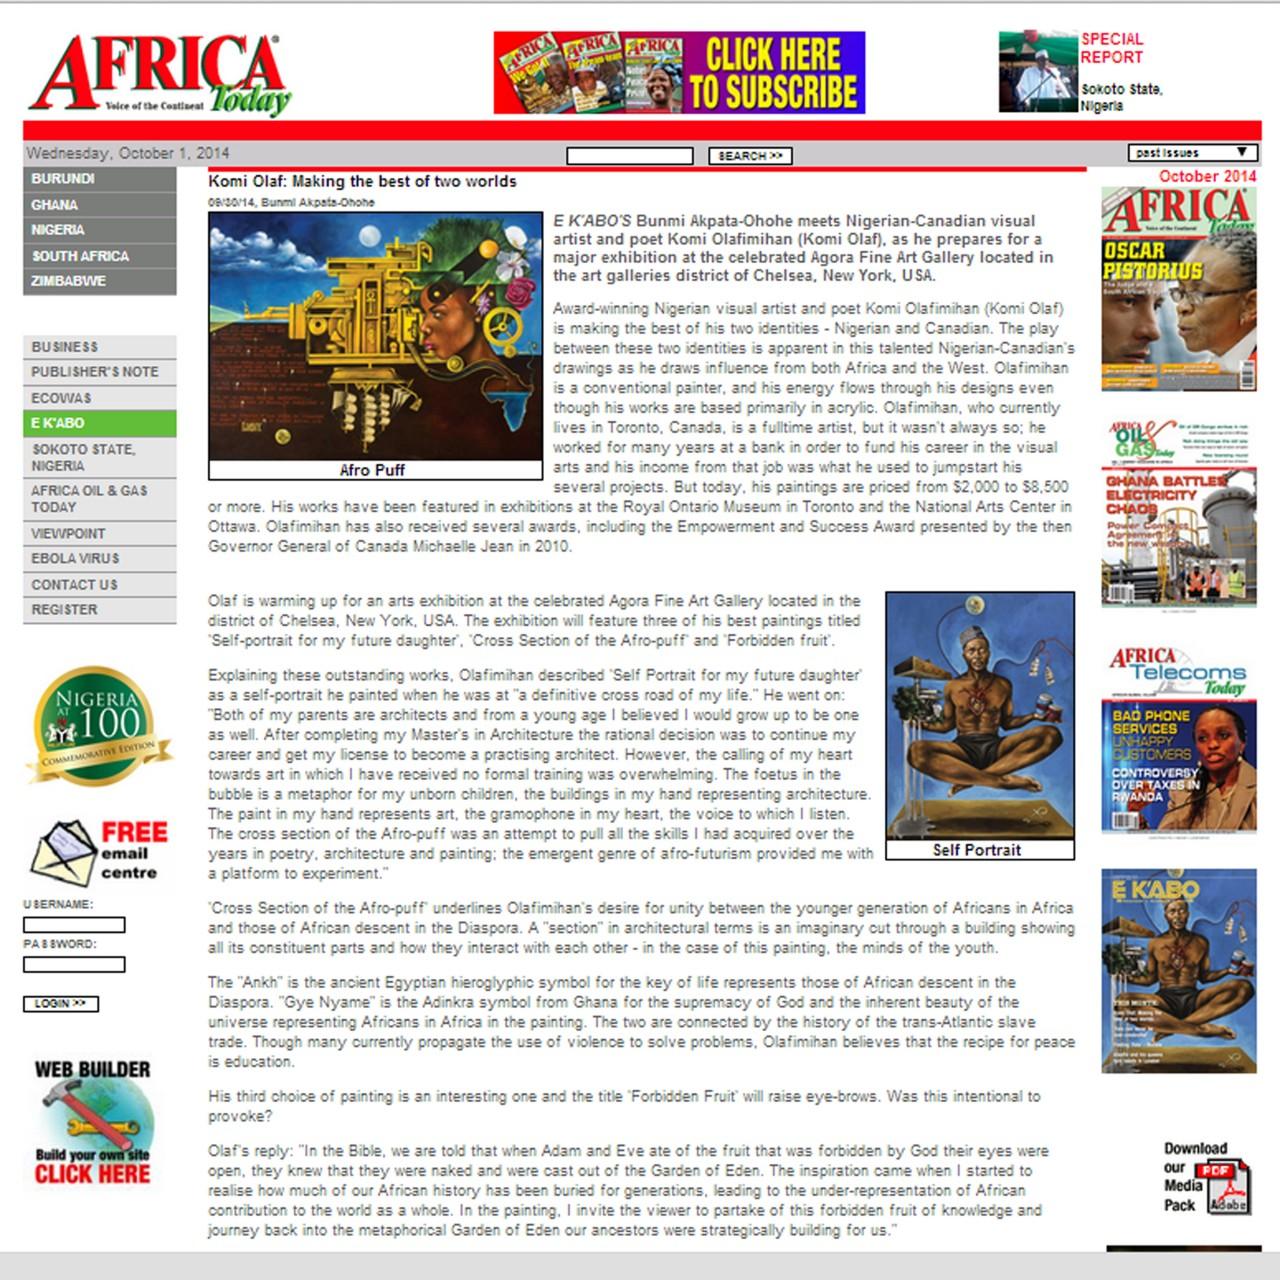 http://africatoday.com/cgi-bin/public.v0.2.cgi?sub=news&action=one&cat=154&id=2584